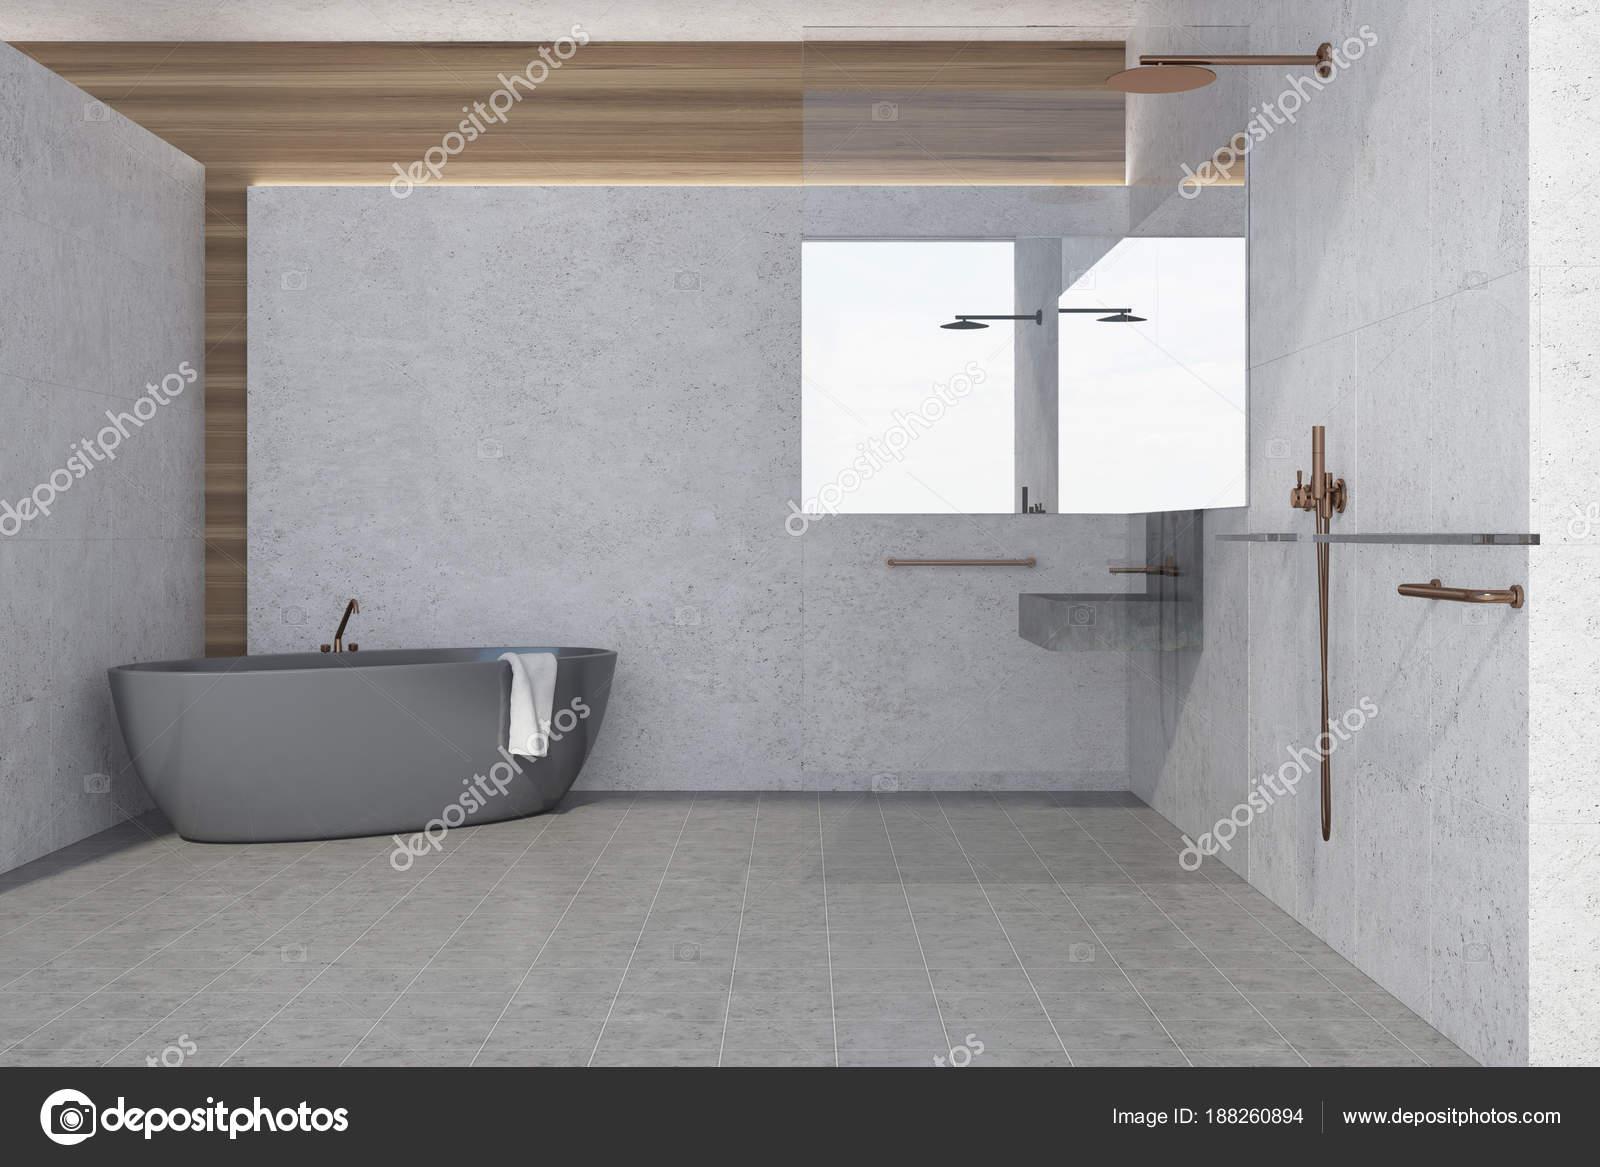 Vasca da bagno in cemento - Vasca da bagno in cemento ...